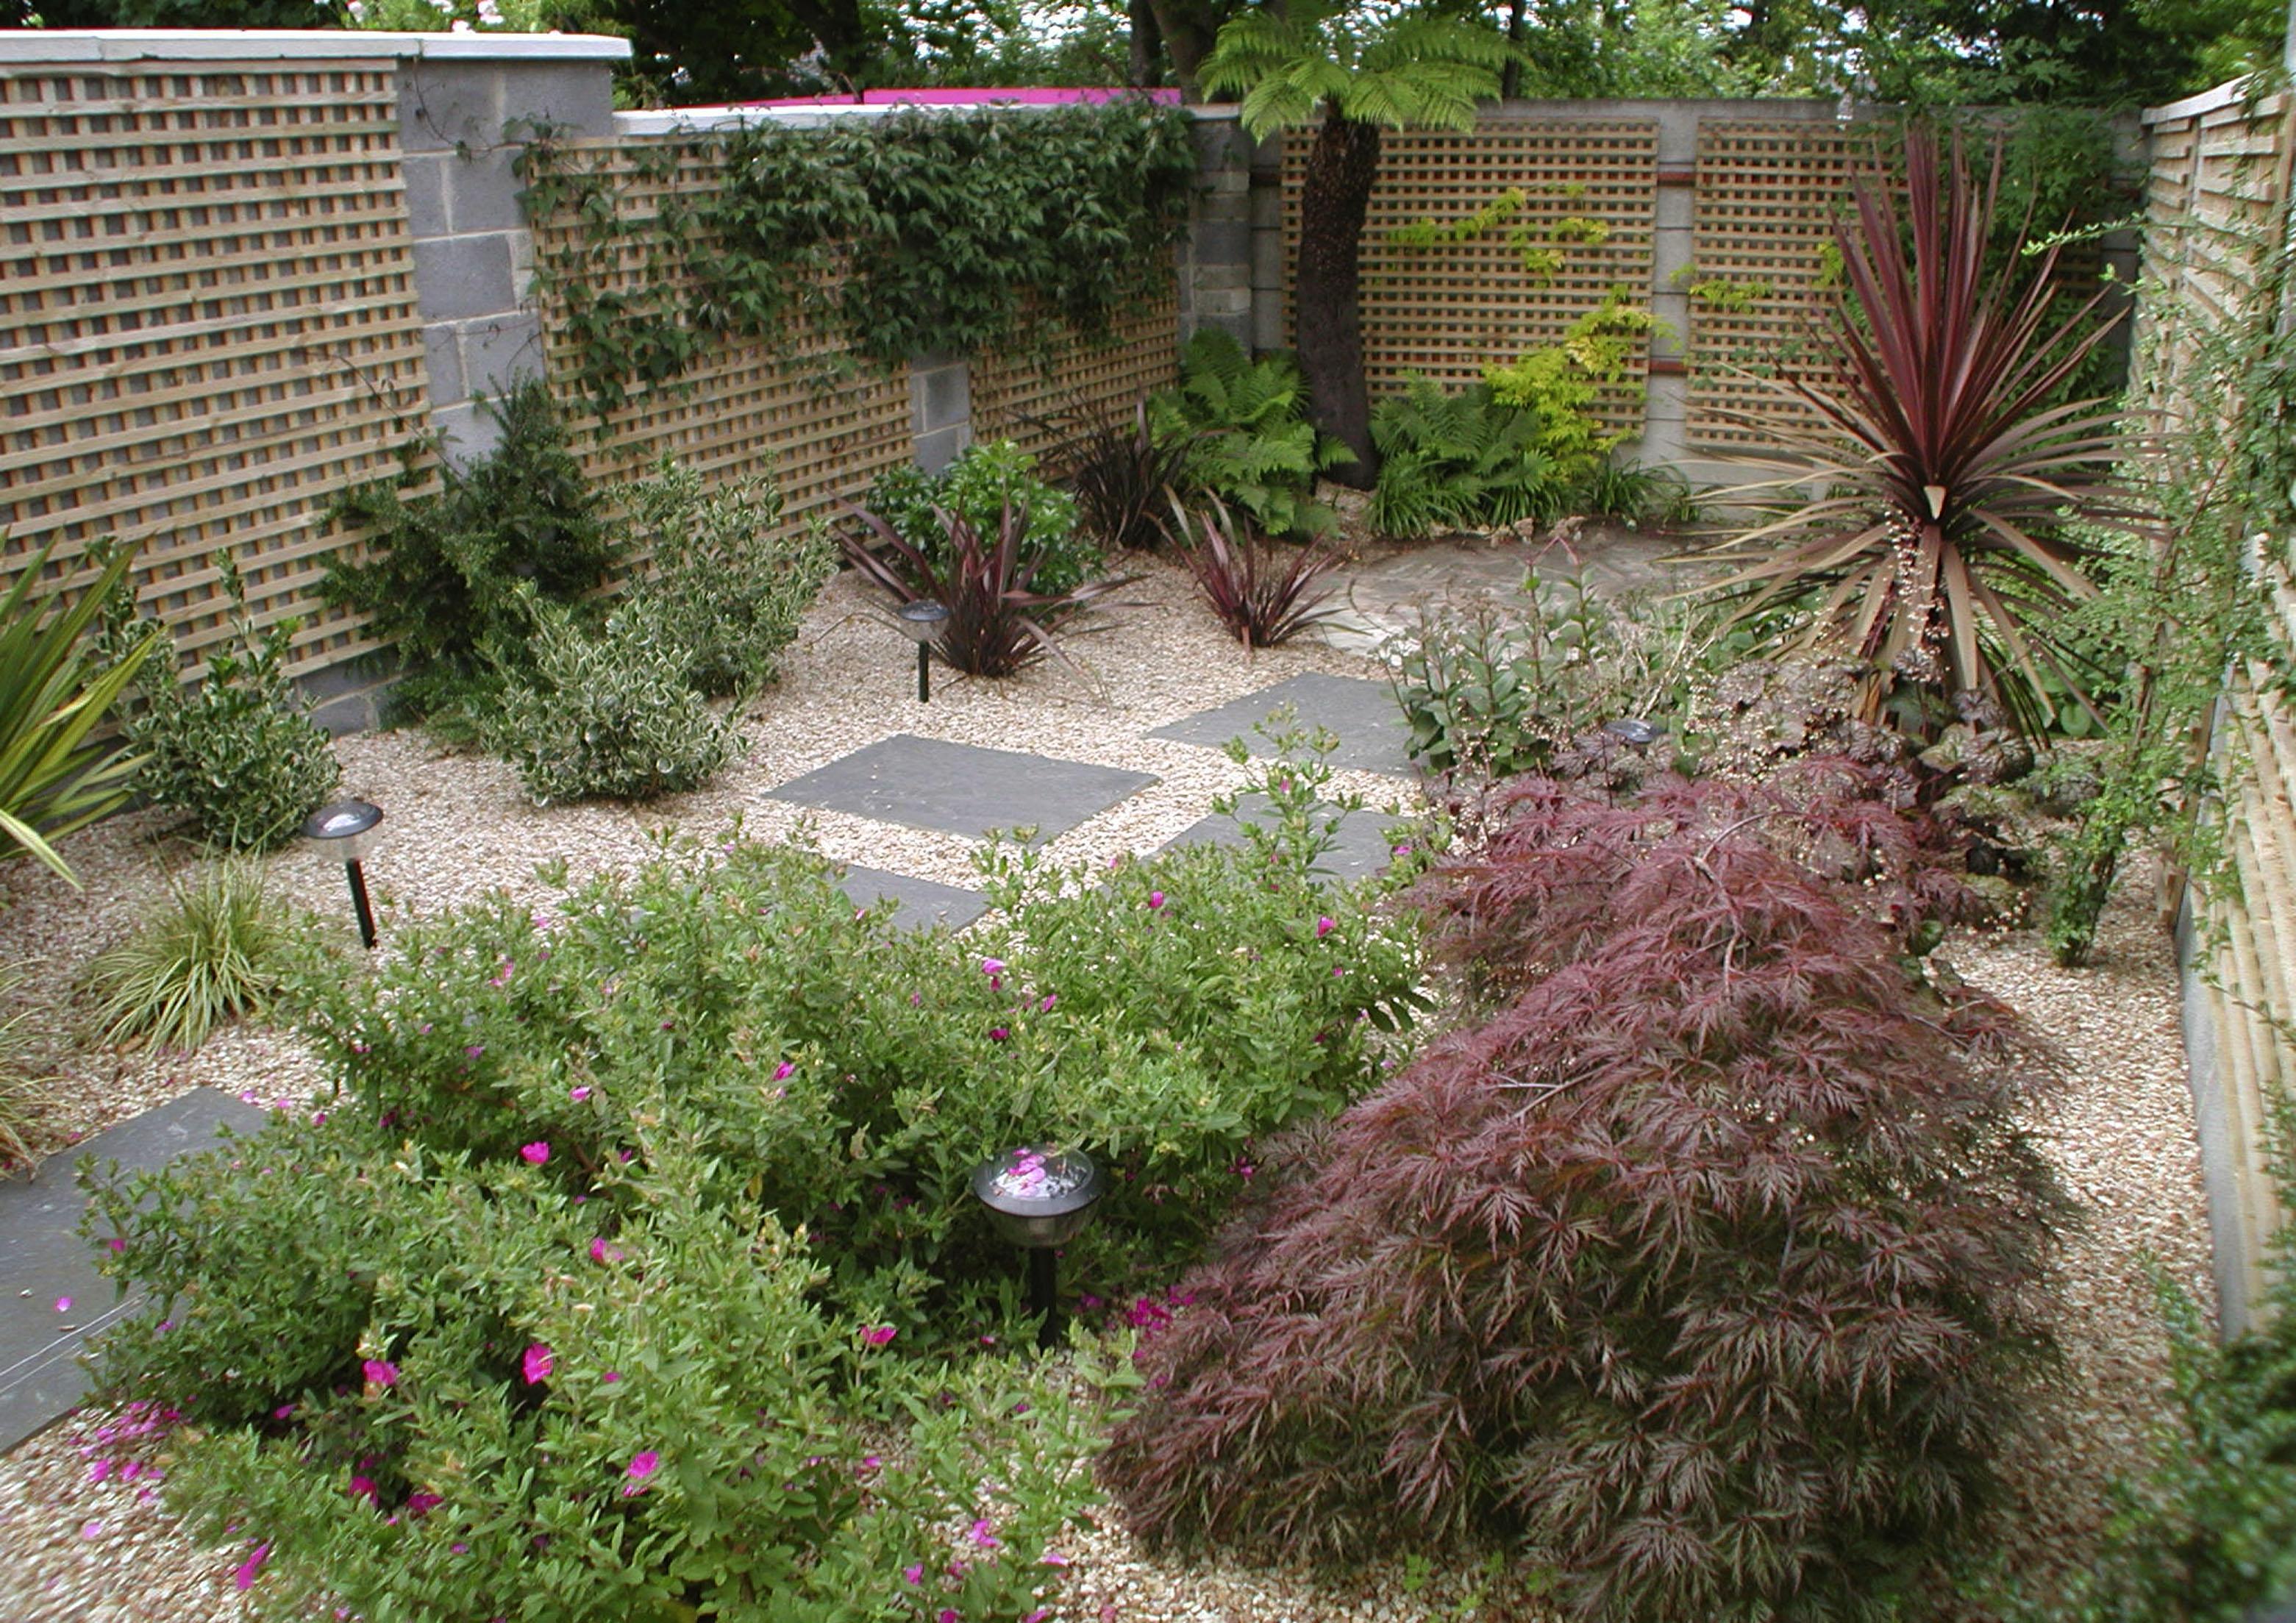 Low maintenance garden design dublin for Garden design dublin